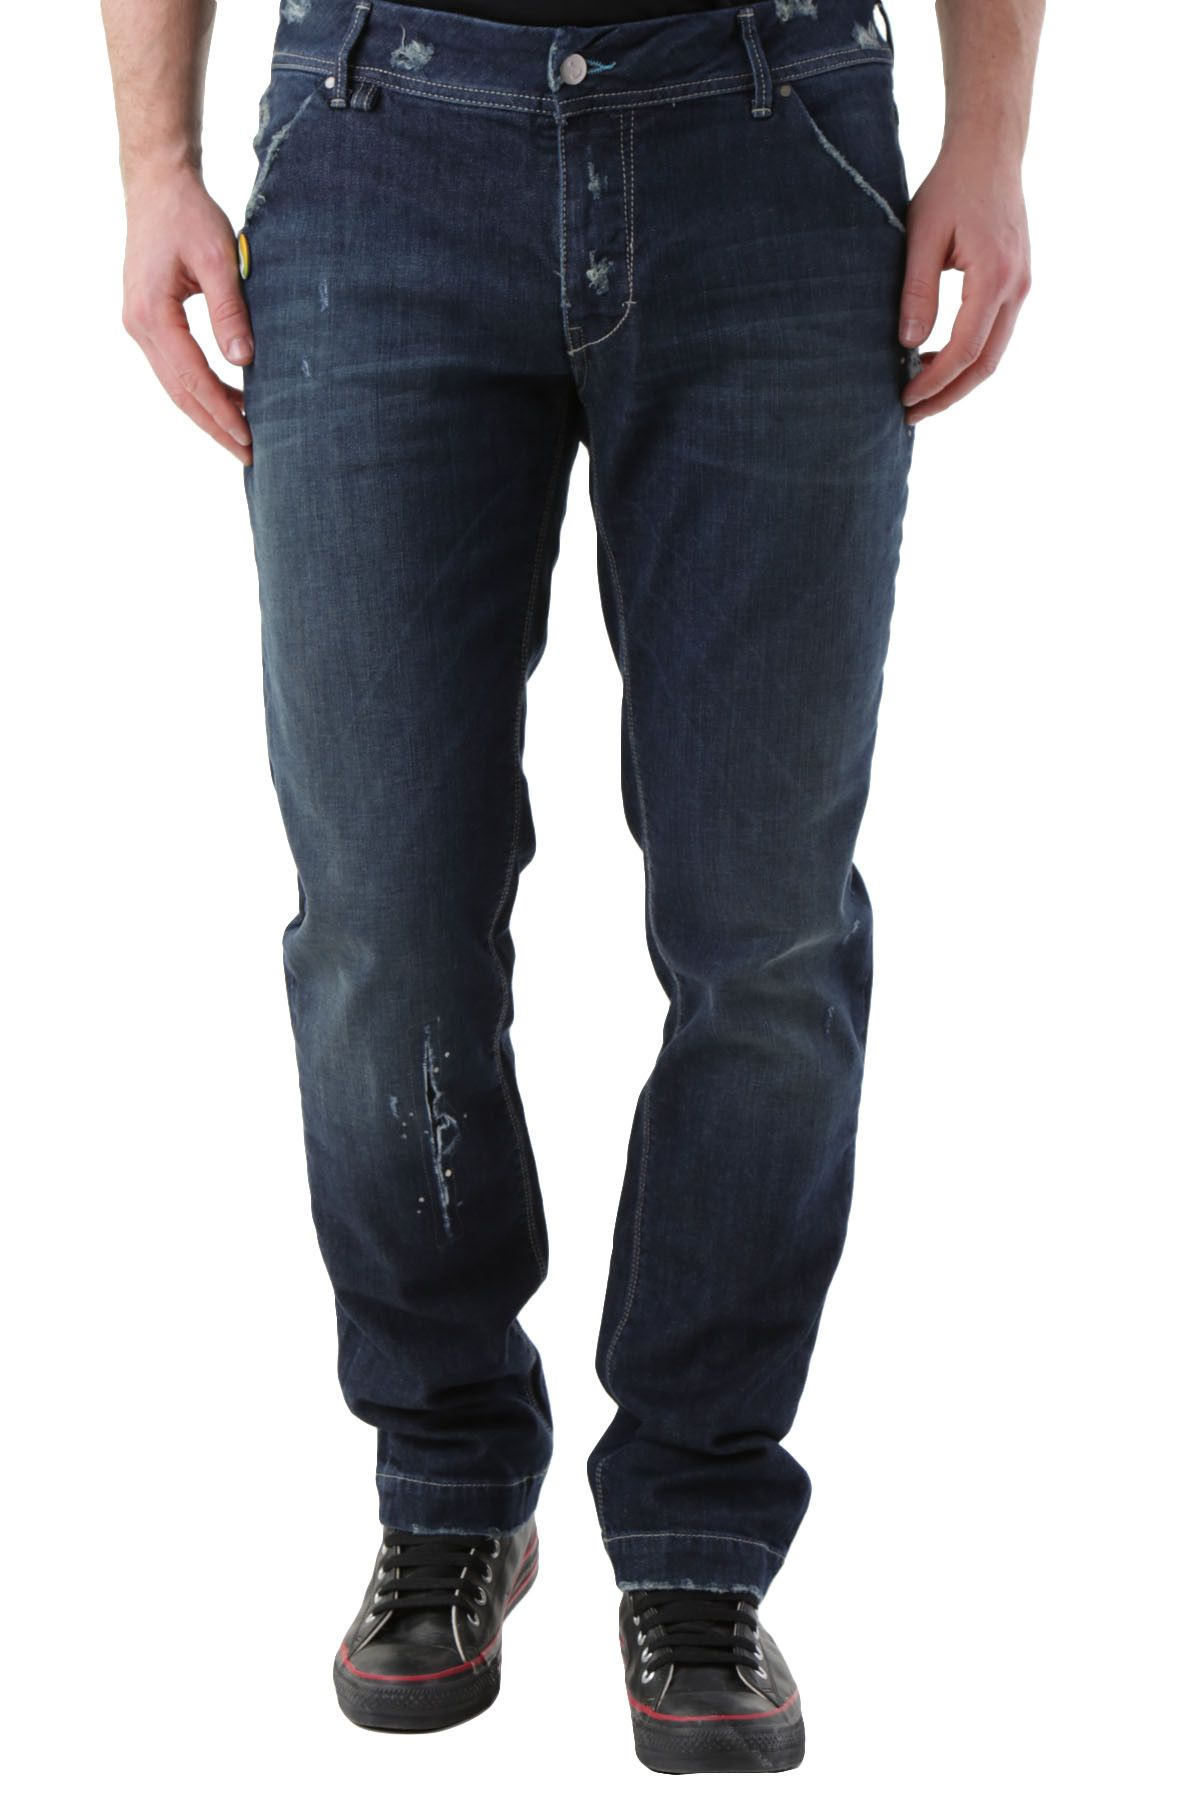 Jcolor Men's Jeans In Blue